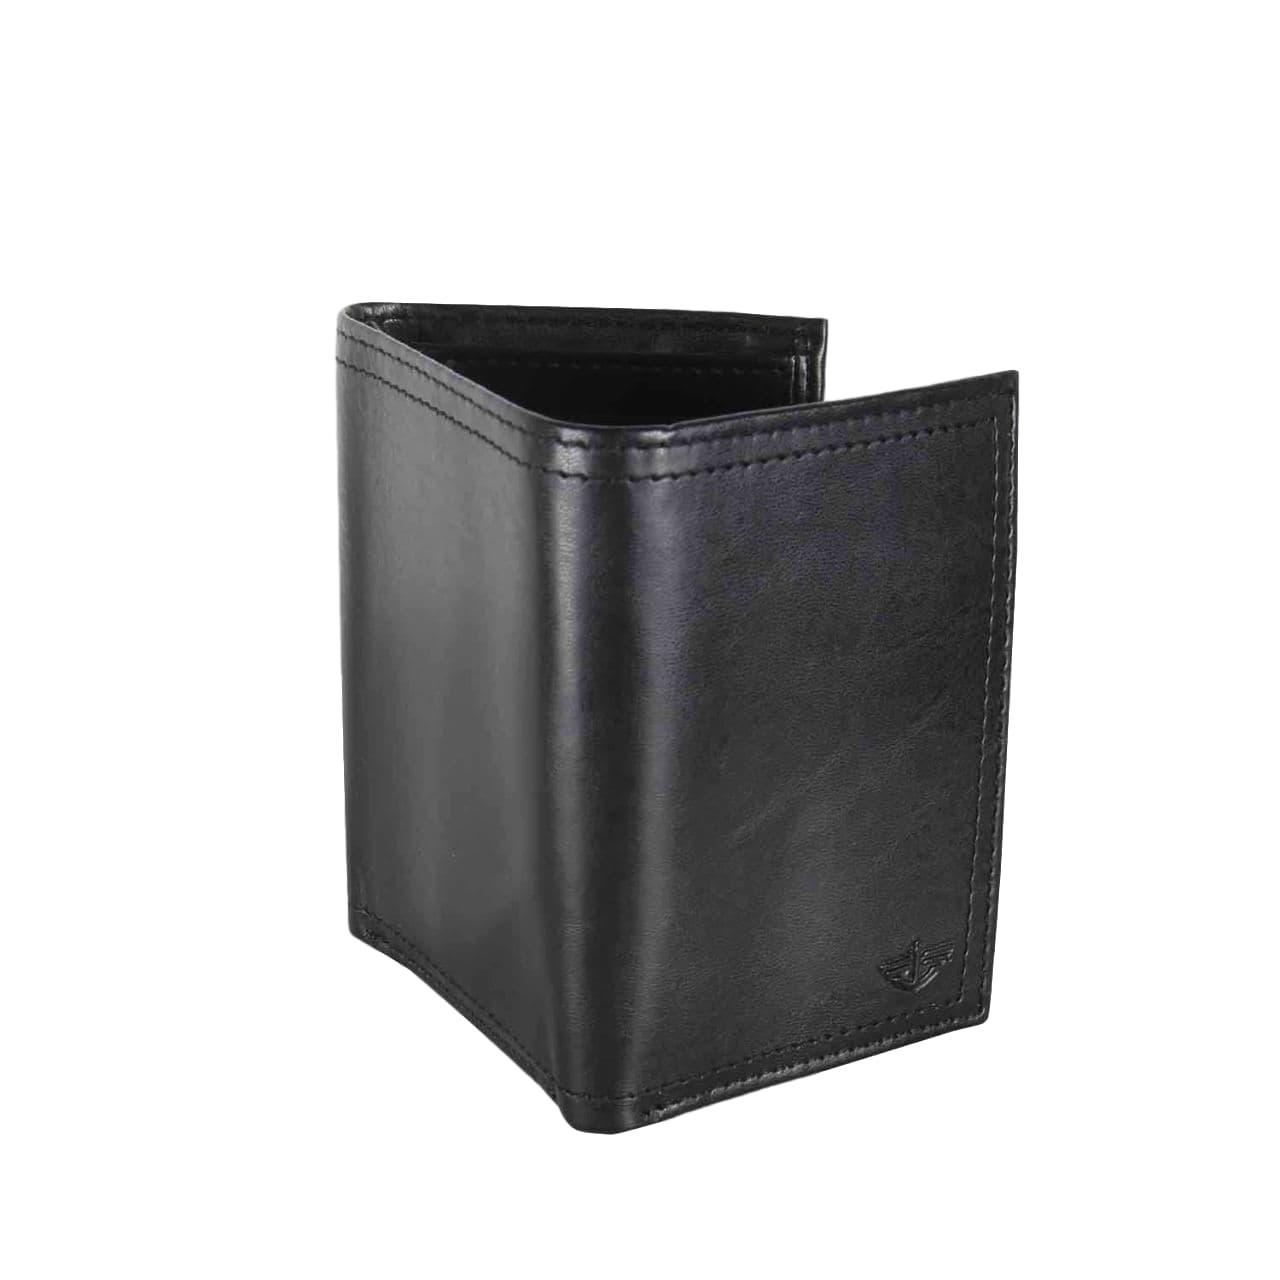 Dockers-Men-039-s-Trifold-Wallet thumbnail 10